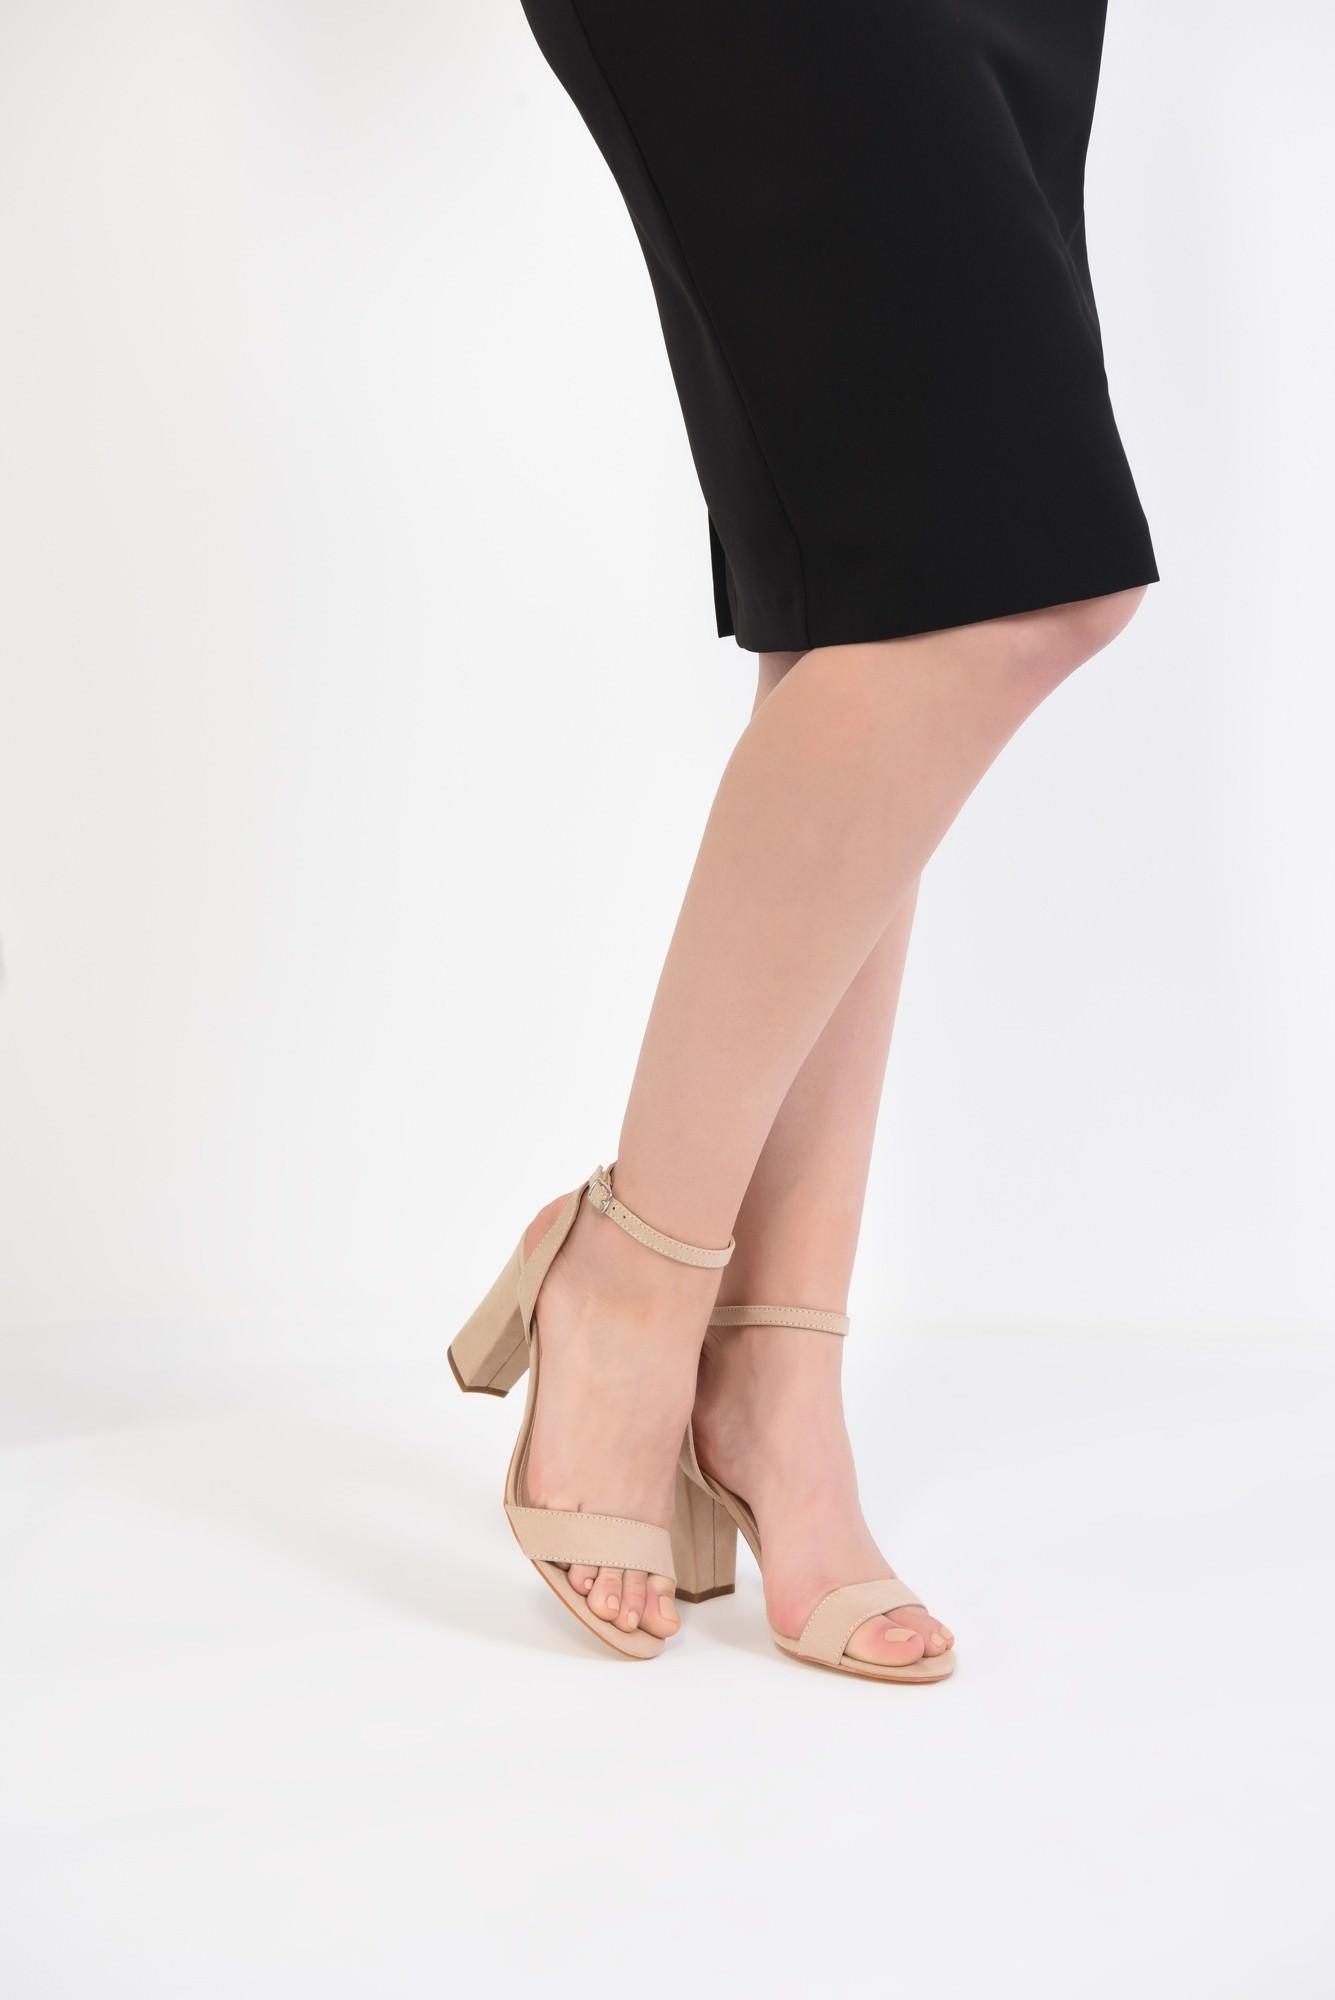 4 - sandale elegante, crem, toc gros, piele intoarsa eco